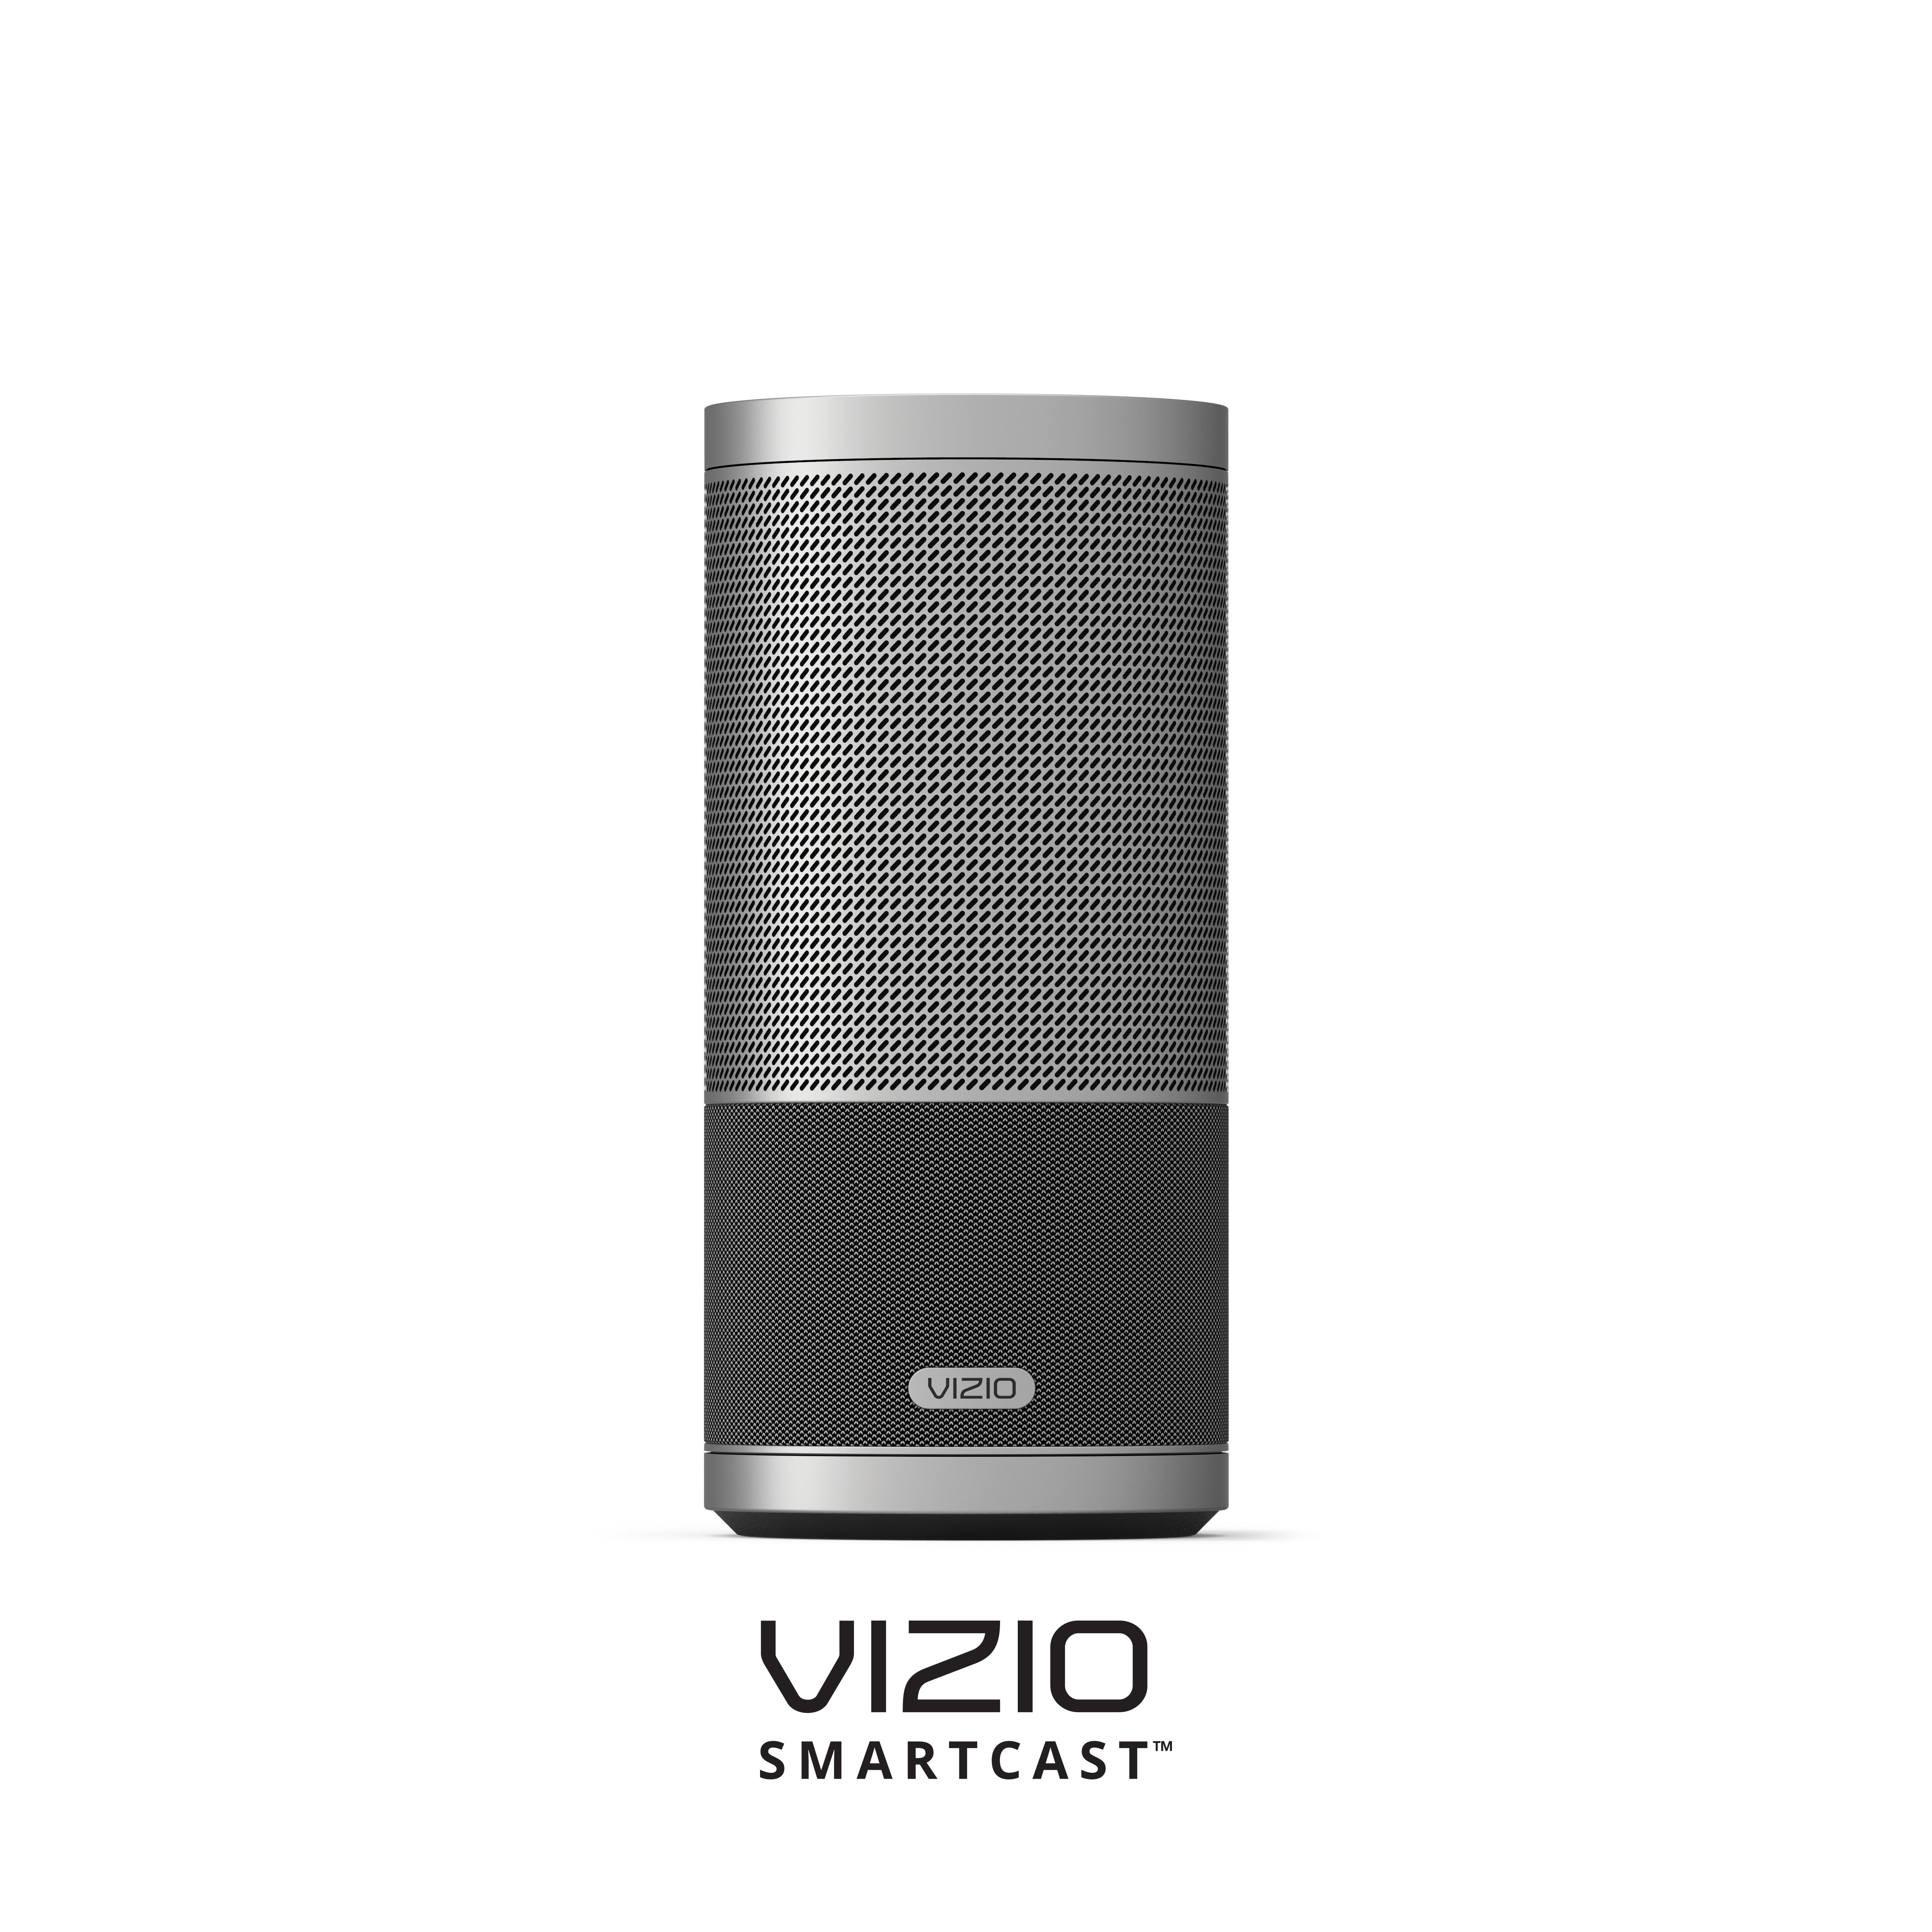 VIZIO SmartCast™ Crave 360™ Wireless Speaker $124.99